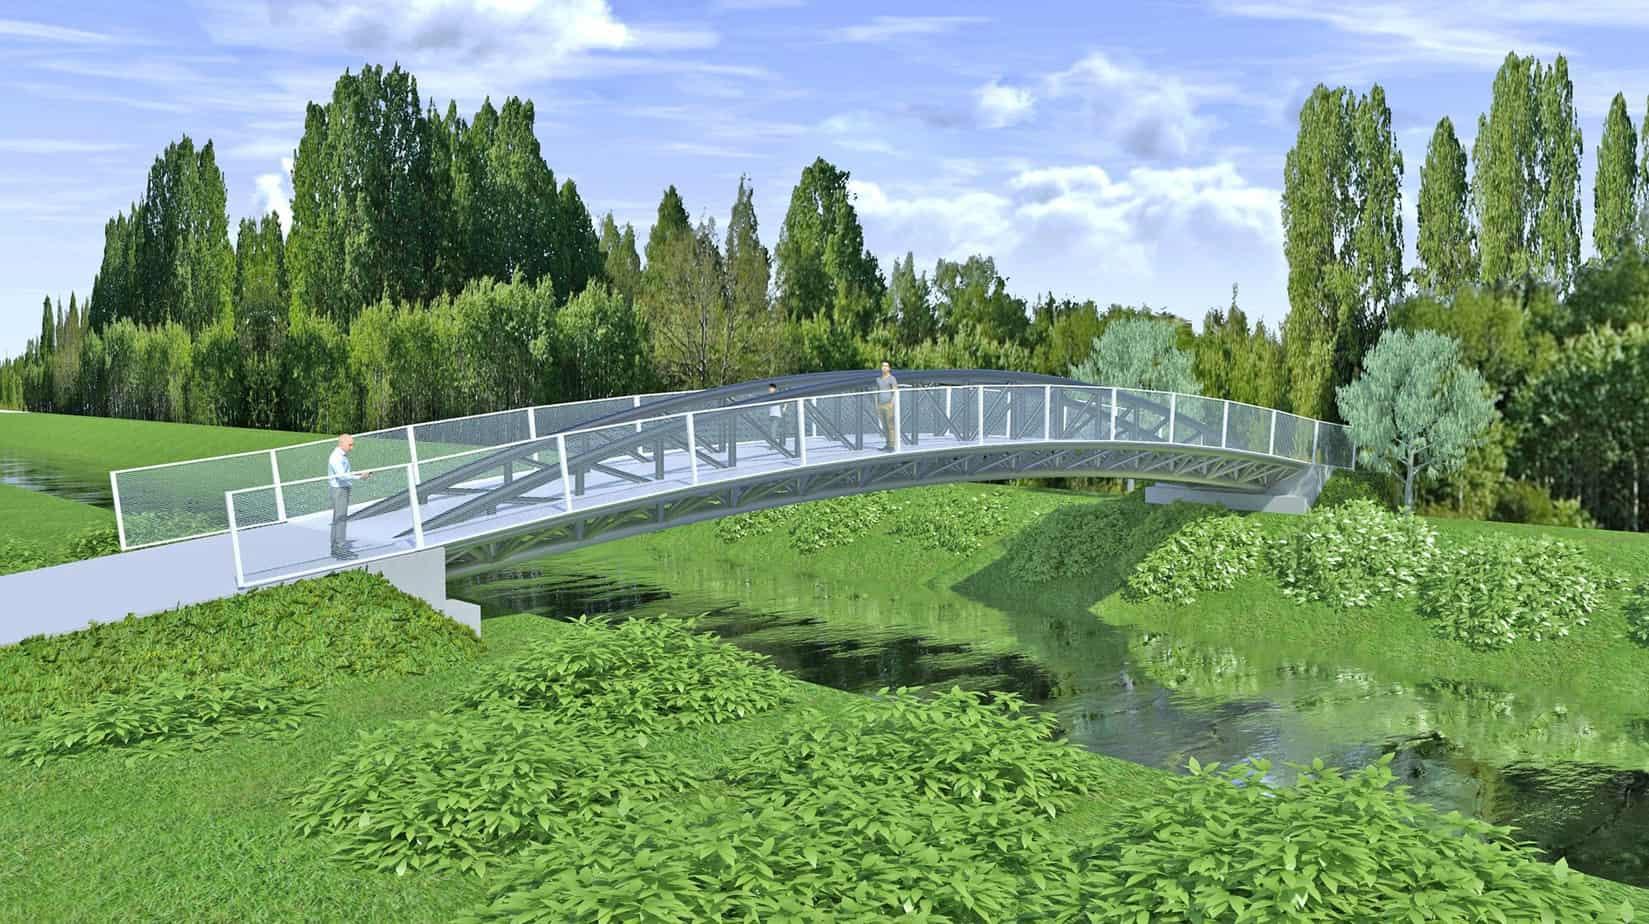 Un rendering di un ponte ciclopedonale